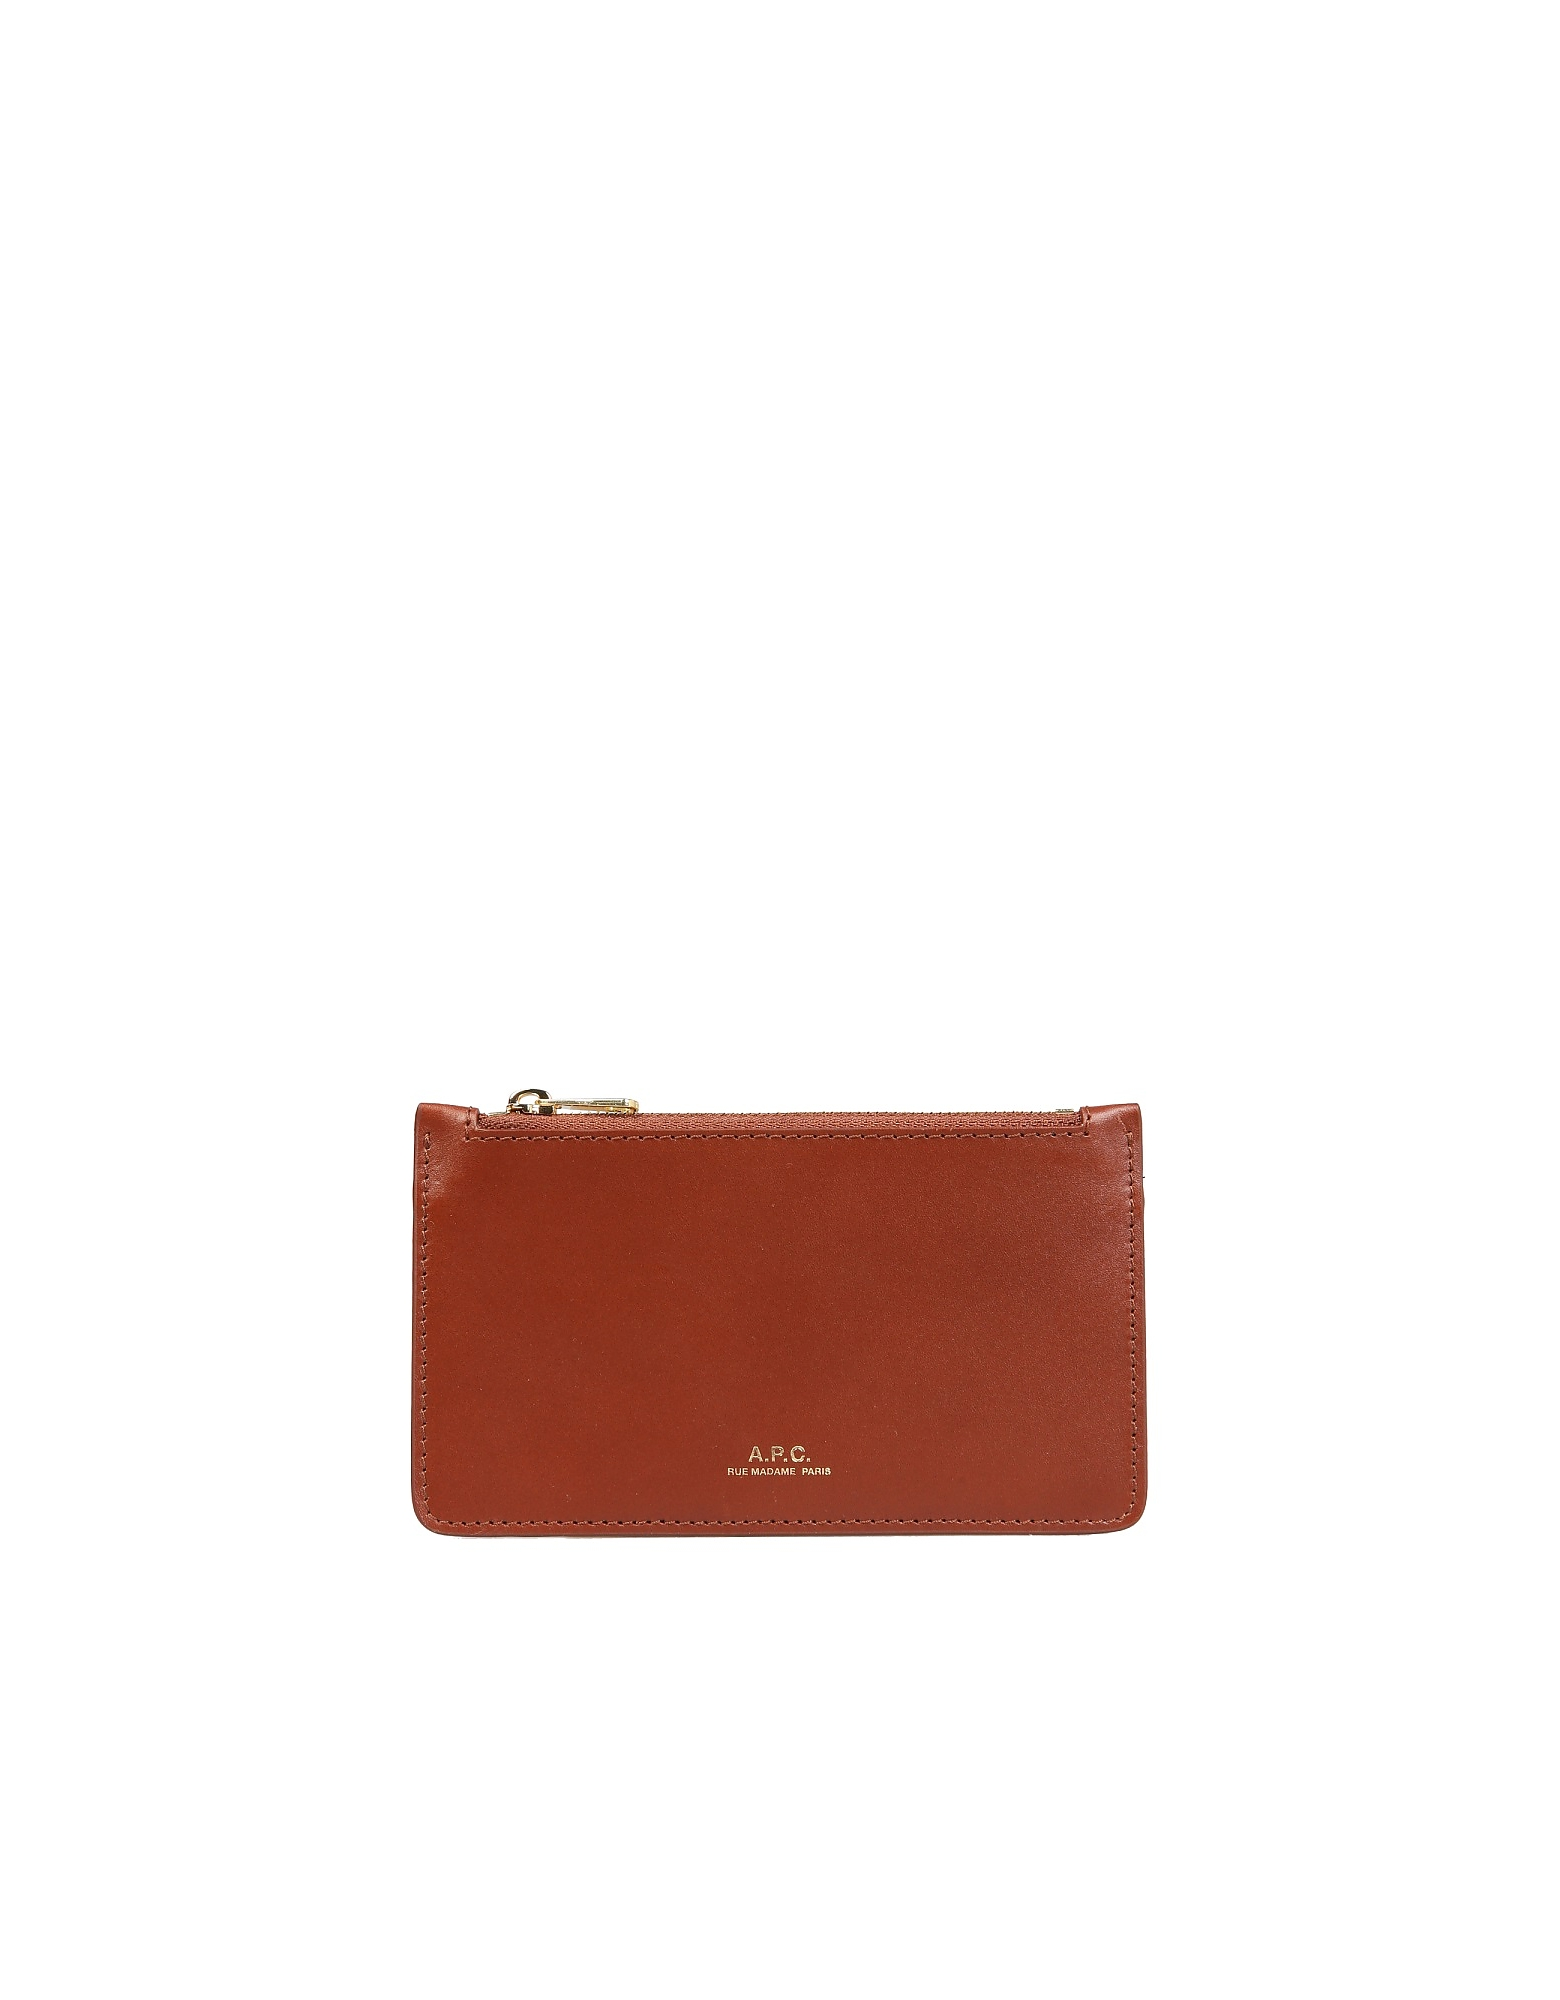 A.P.C. Designer Wallets,